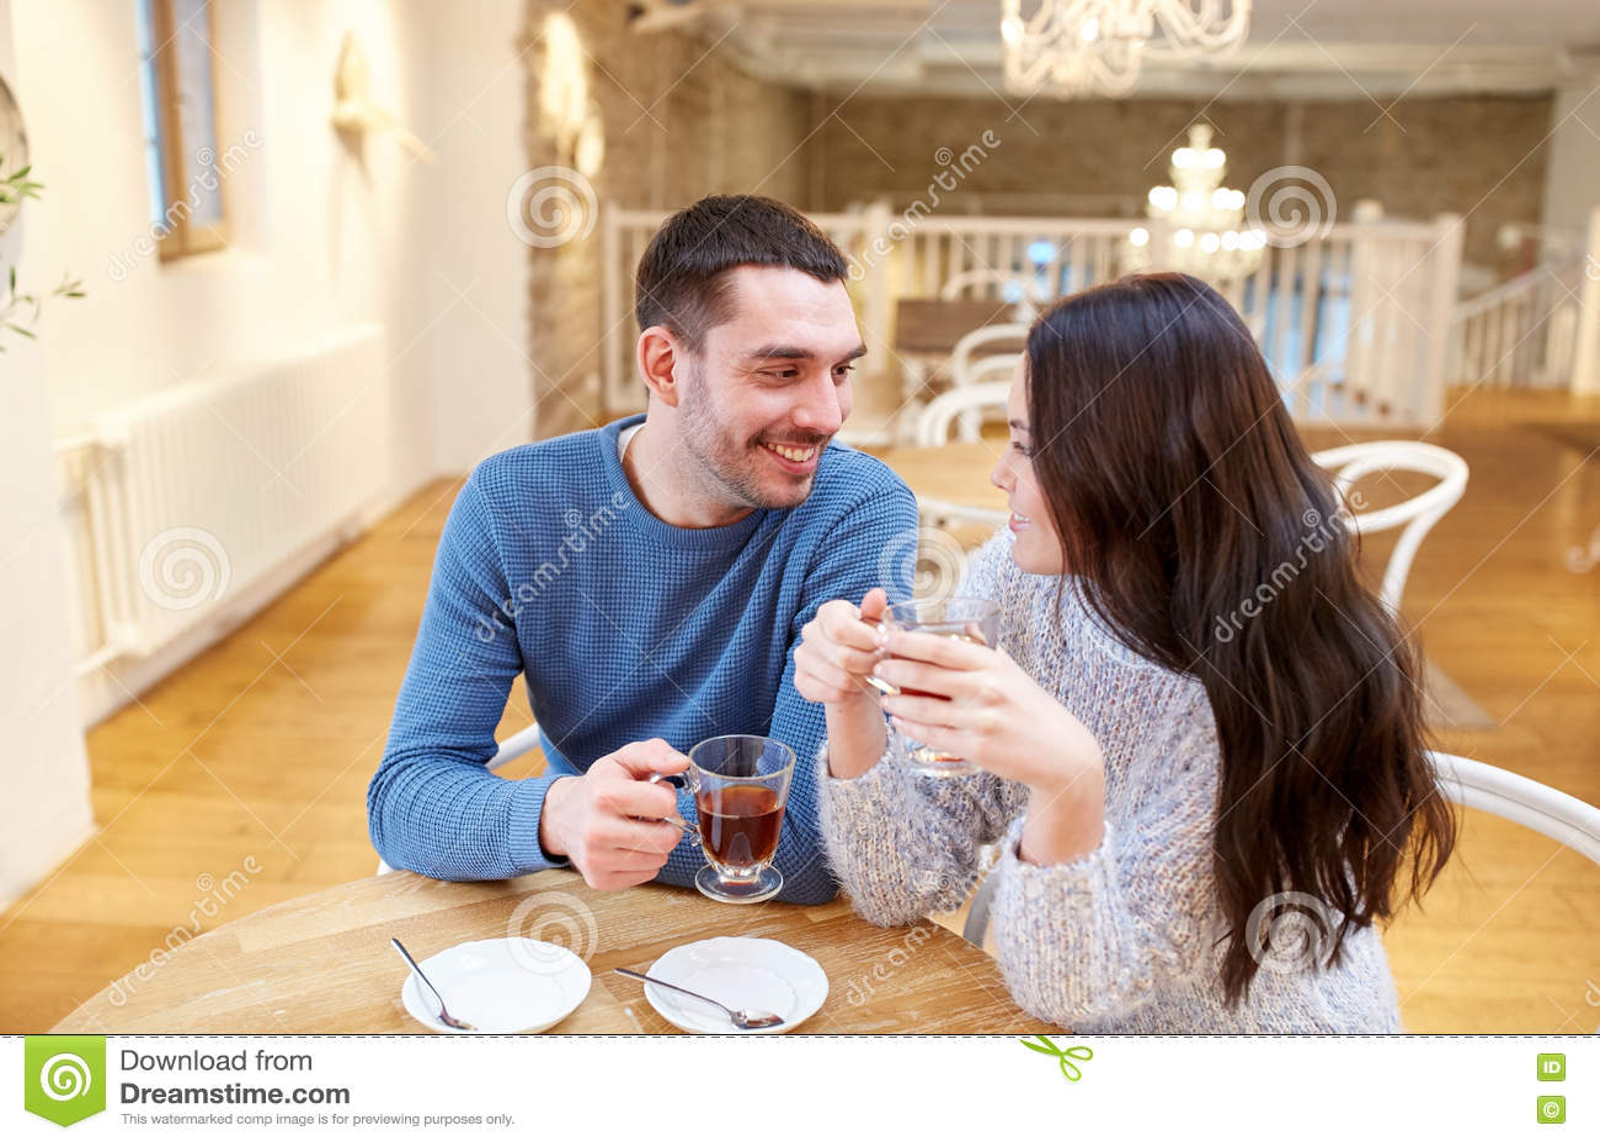 tea black single men Whitemenblackwomenmeet is the best dating site where white men looking for black women, and black women dating white men find singles, date interracially.